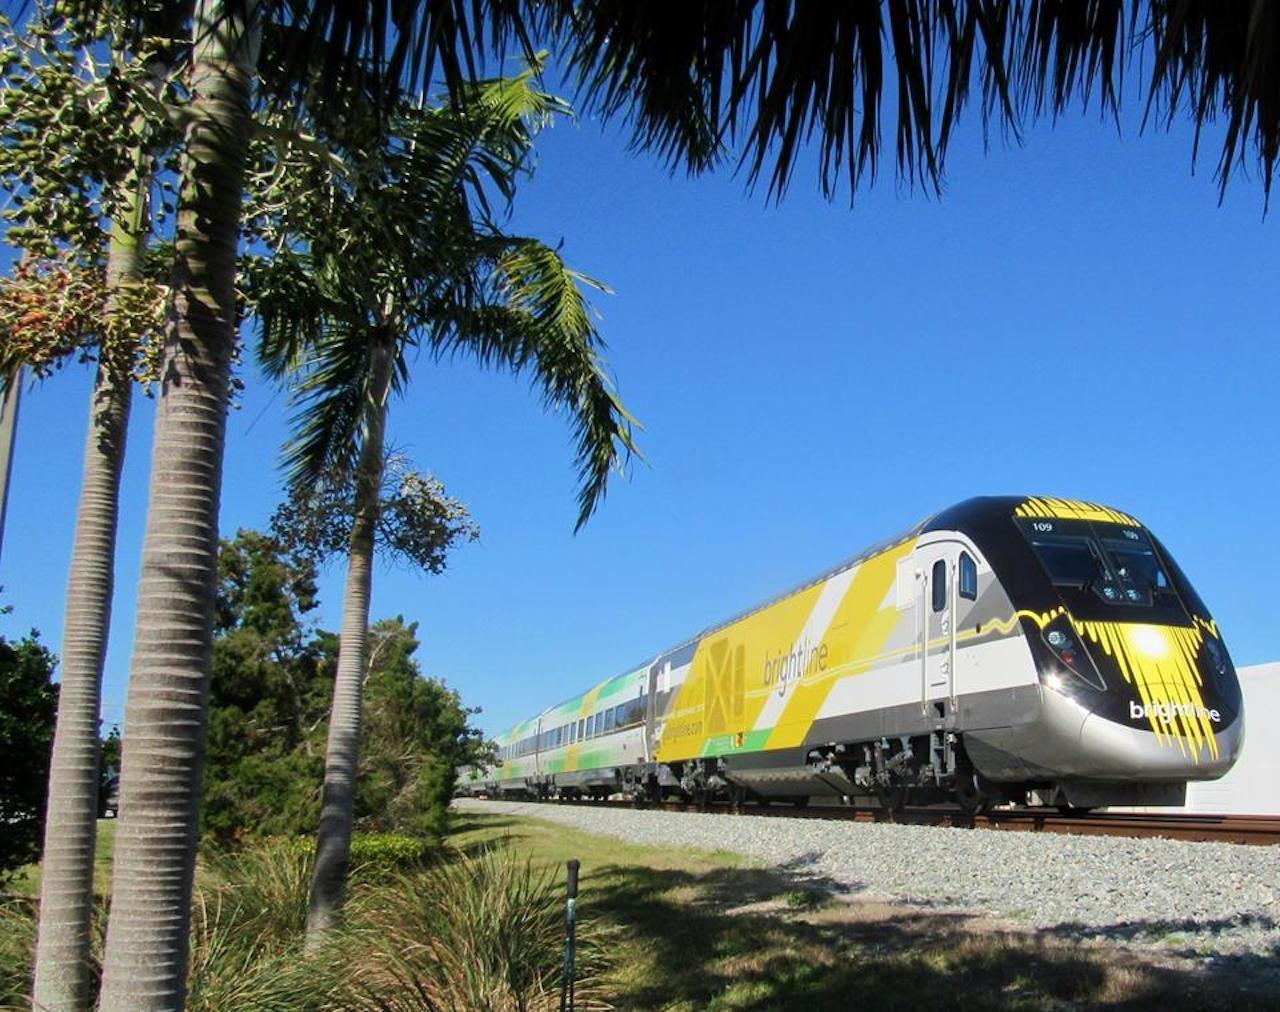 GoBrightline train